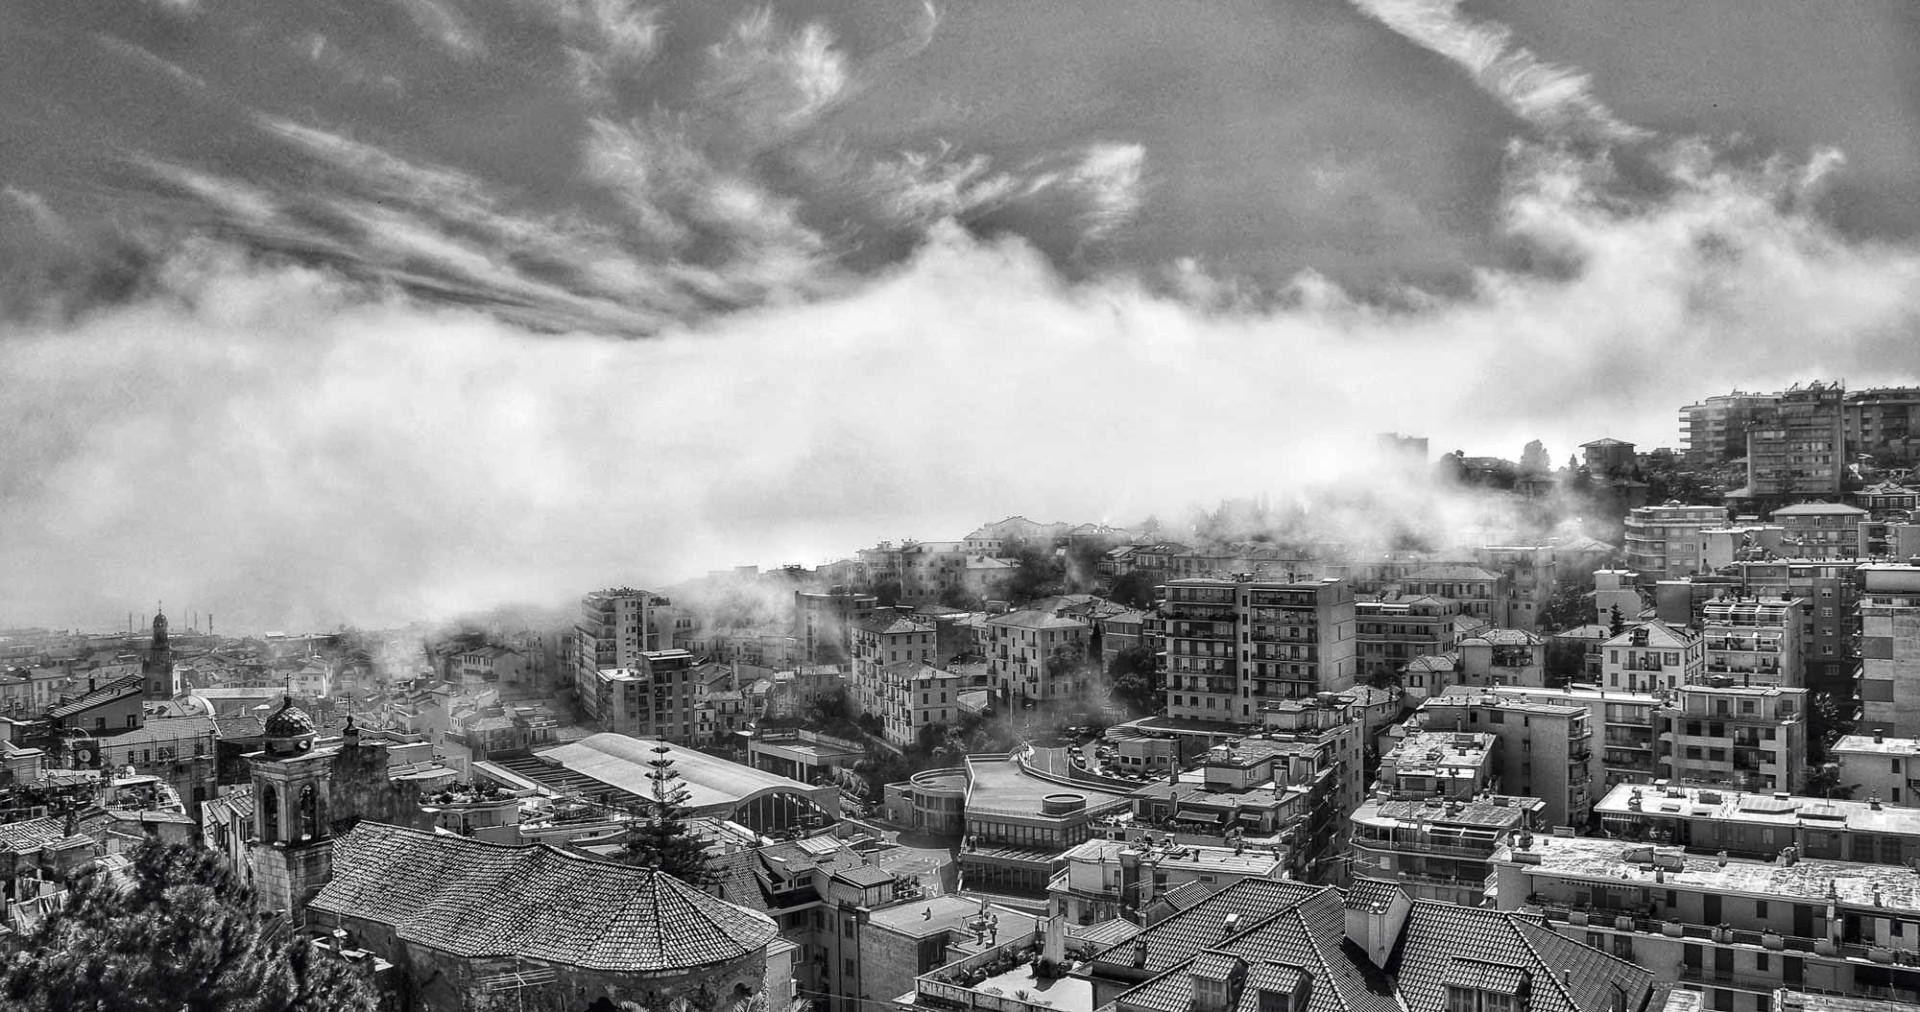 Mistery fog in Sanremo - Italy